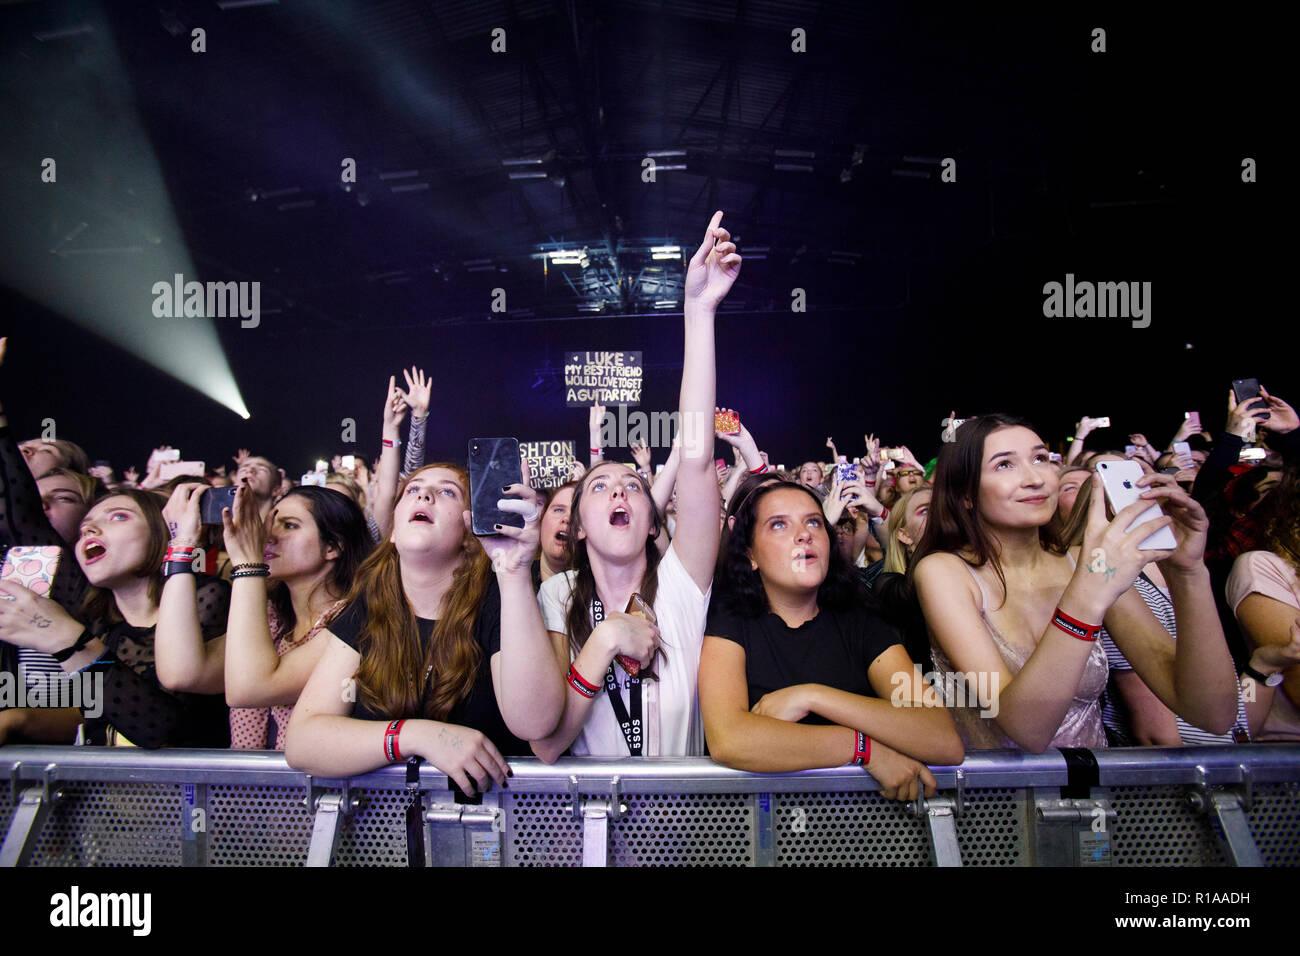 Denmark Copenh November 8 2018 Ecstatic Concert Goers Attend A Live Concert With The Australian Pop Rock Band 5 Seconds Of Summer At Forum Black